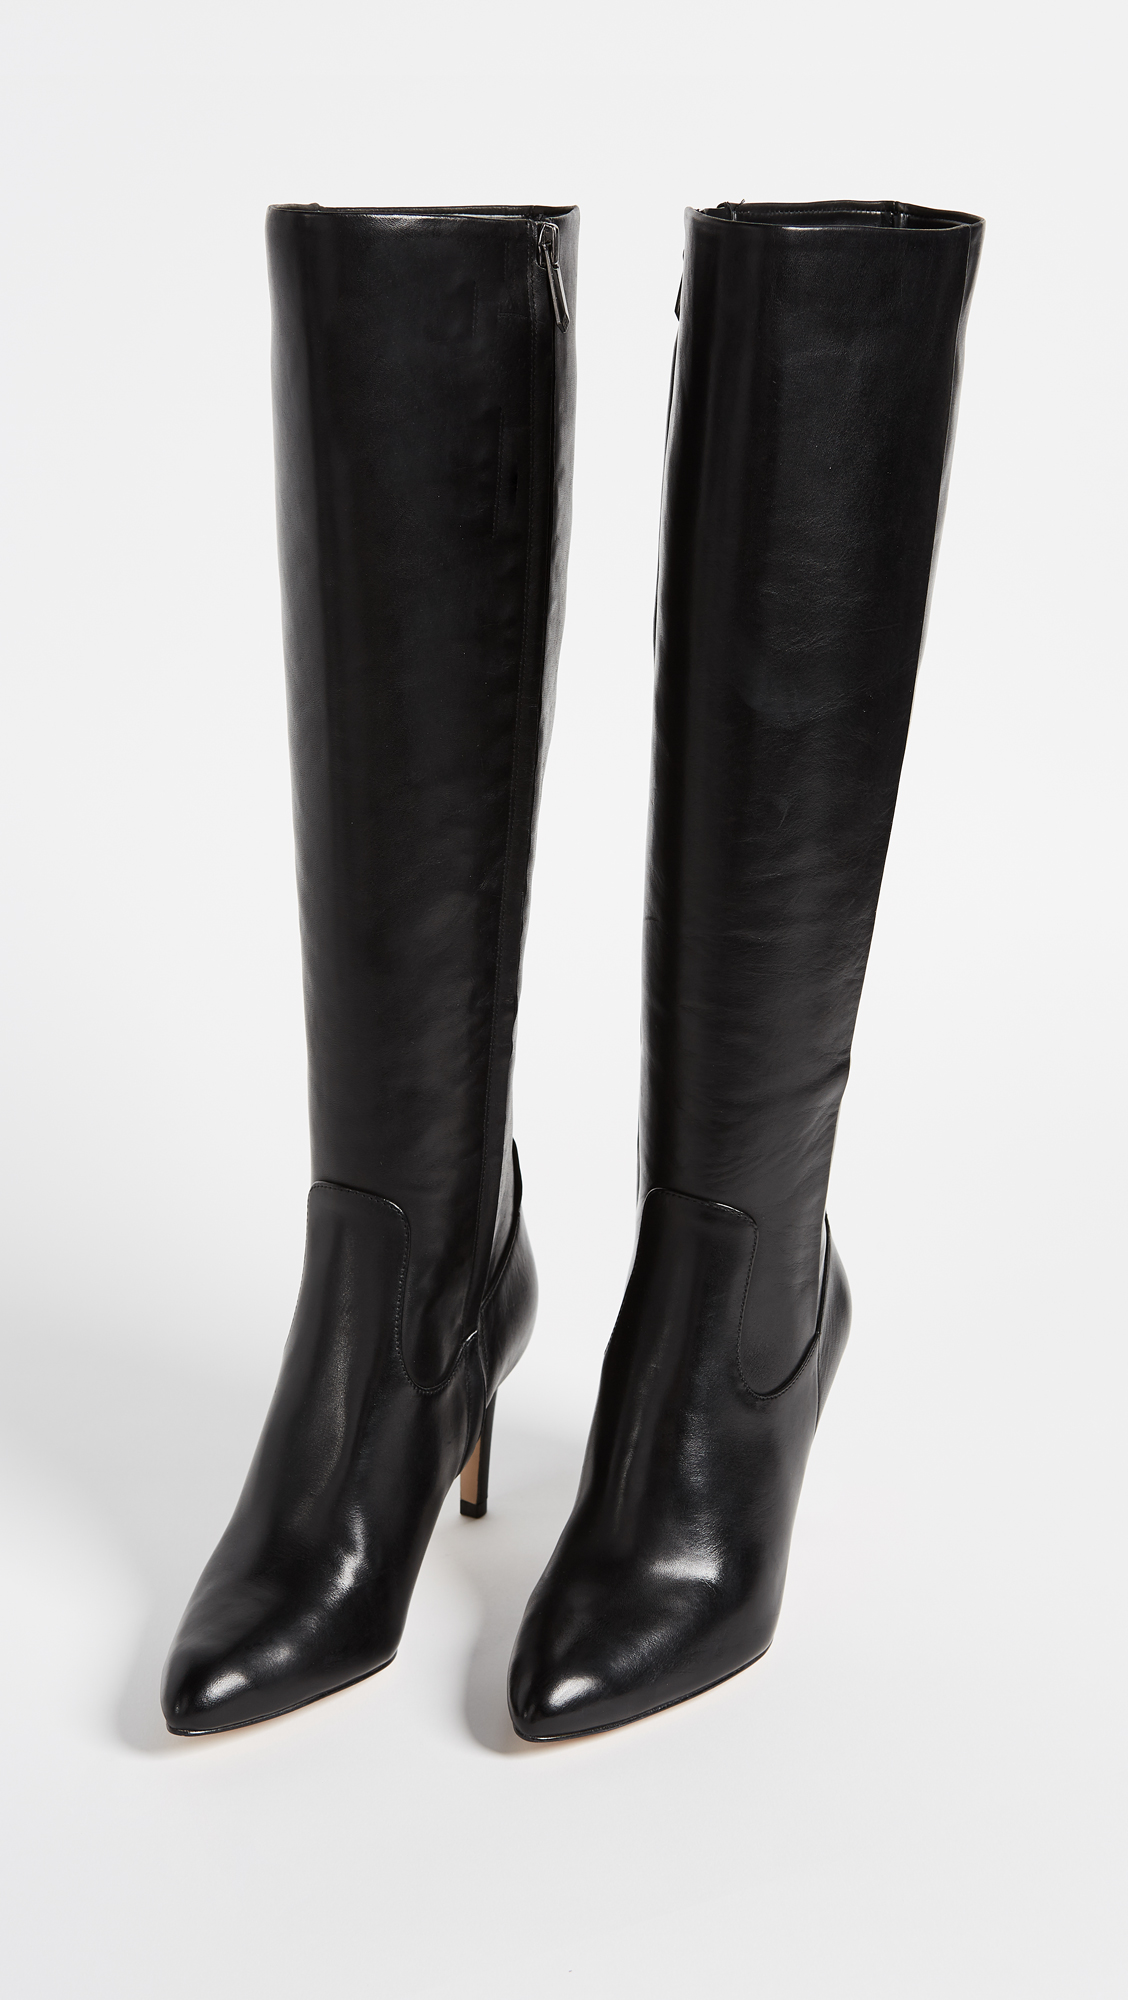 70cd01766f816d Sam Edelman Olencia Tall Boots